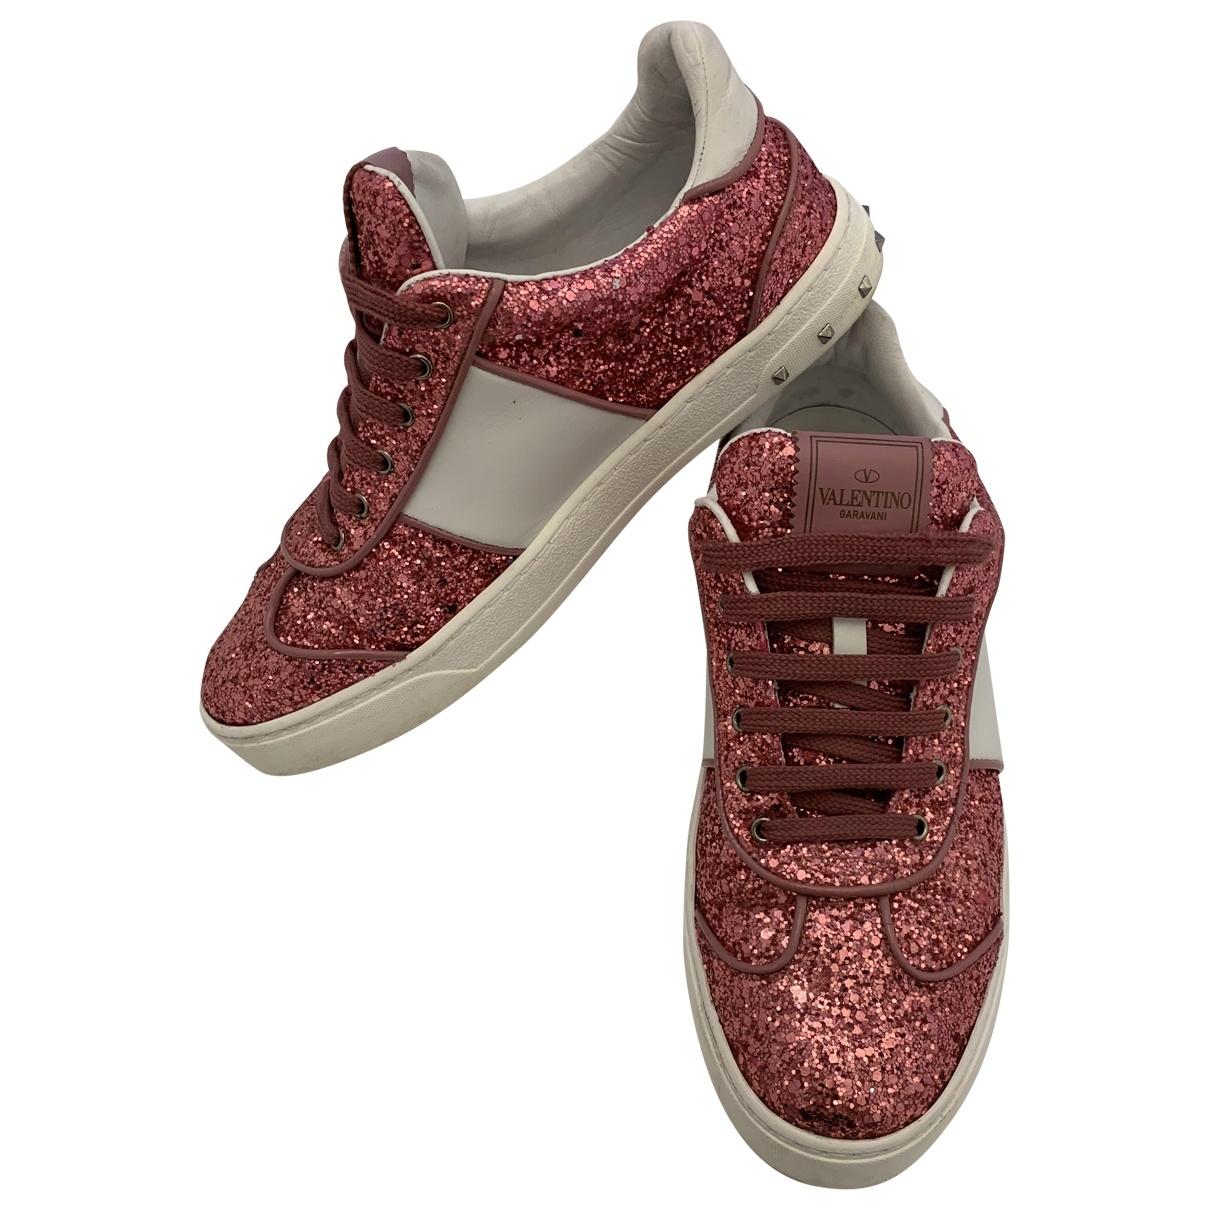 Valentino Garavani Rockstud Pink Glitter Trainers for Women 38 EU